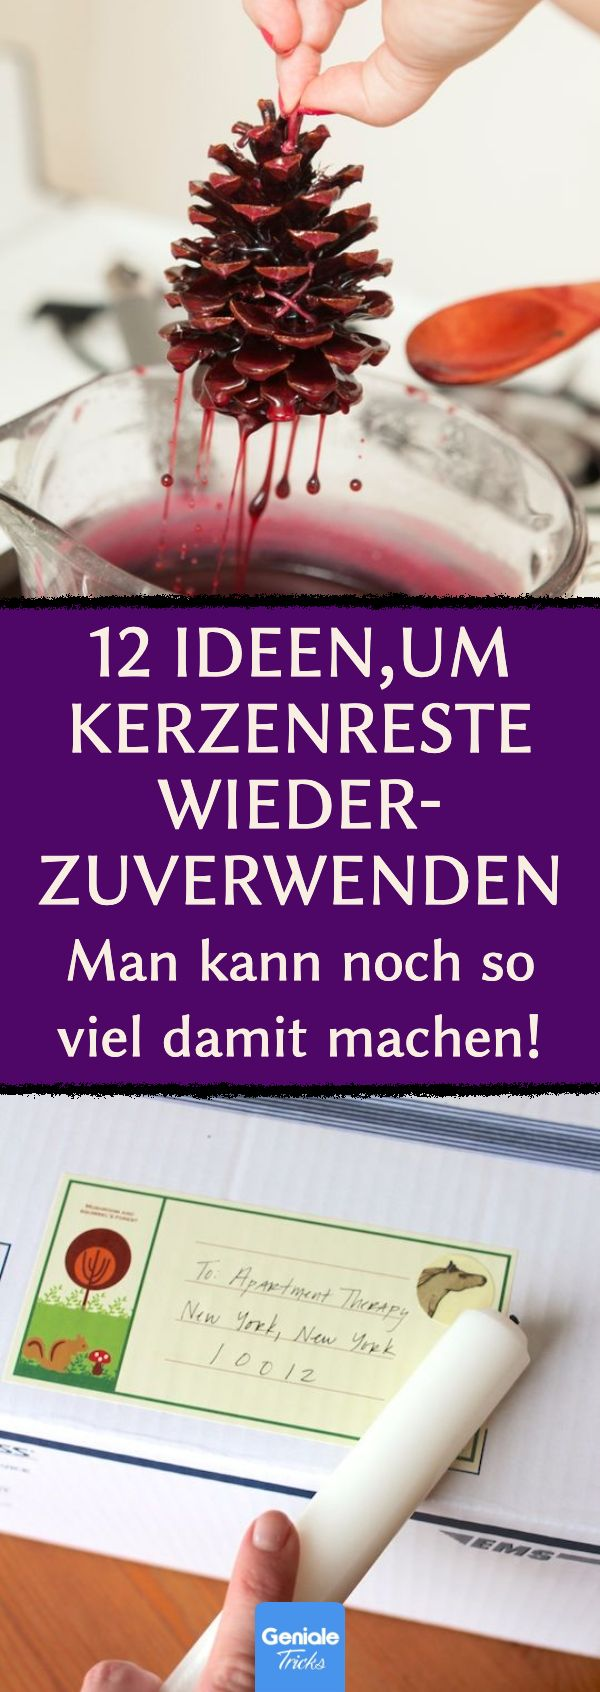 12 Ideen,um Kerzenreste wiederzuverwenden. #kerzenreste #wachsreste #upcycling #kerzen